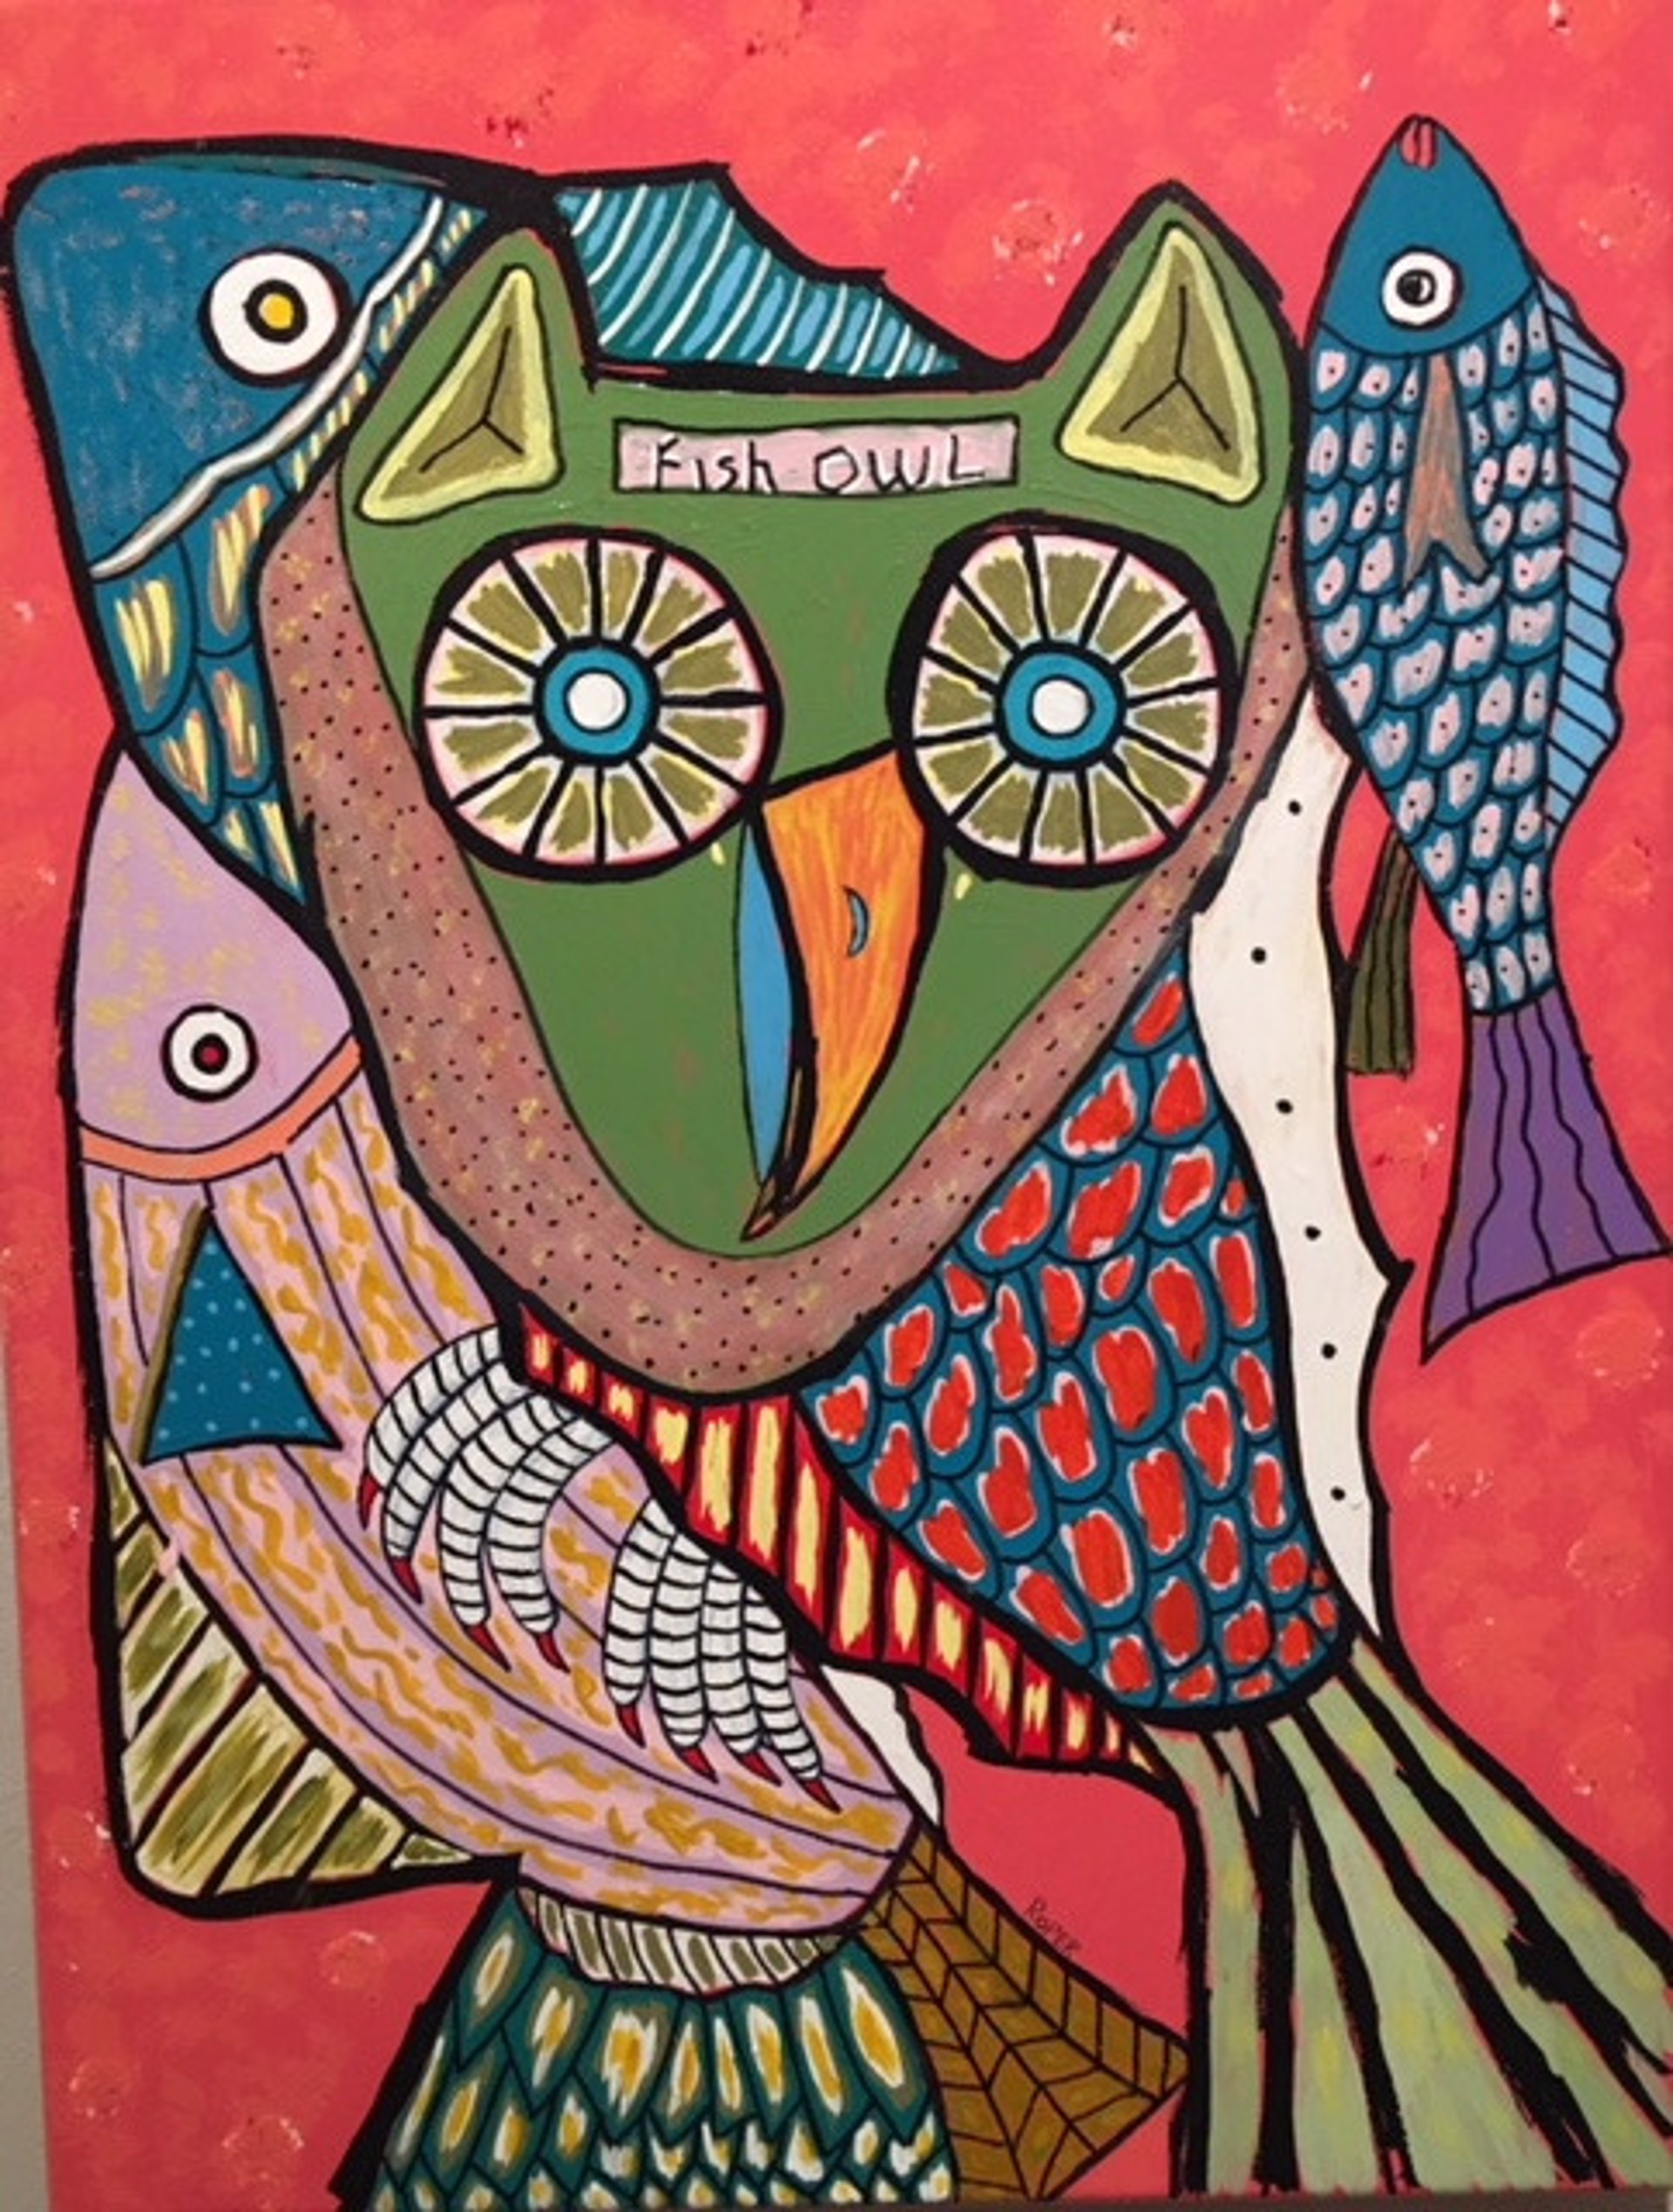 Fish Owl by Billy Roper